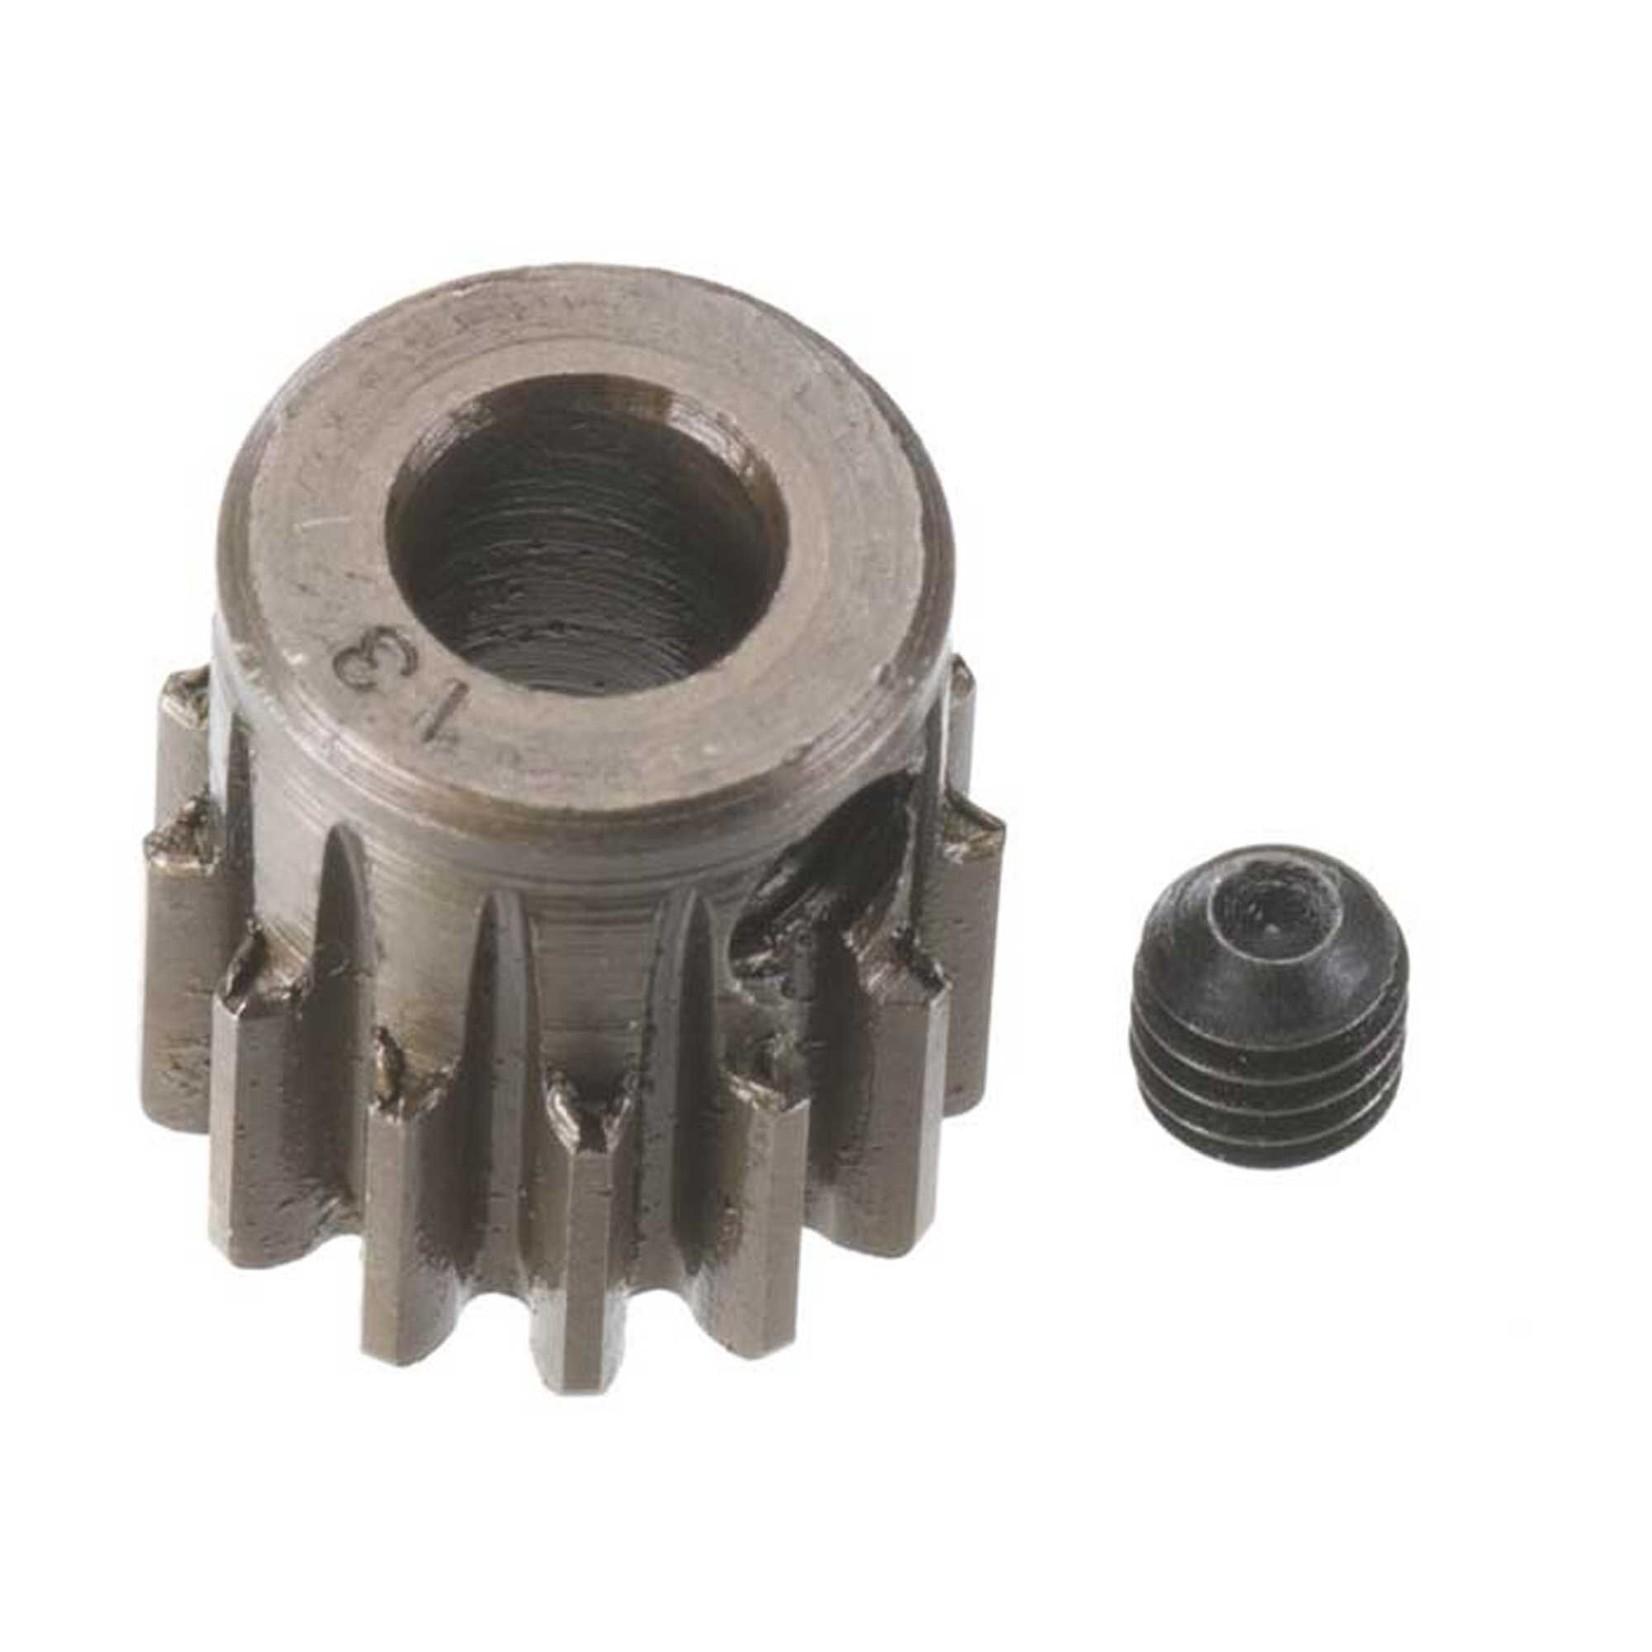 Robinson Racing Products RRP8713 Robinson Racing Extra Hard Steel .8 Mod Pinion Gear w/5mm Bore (13T)